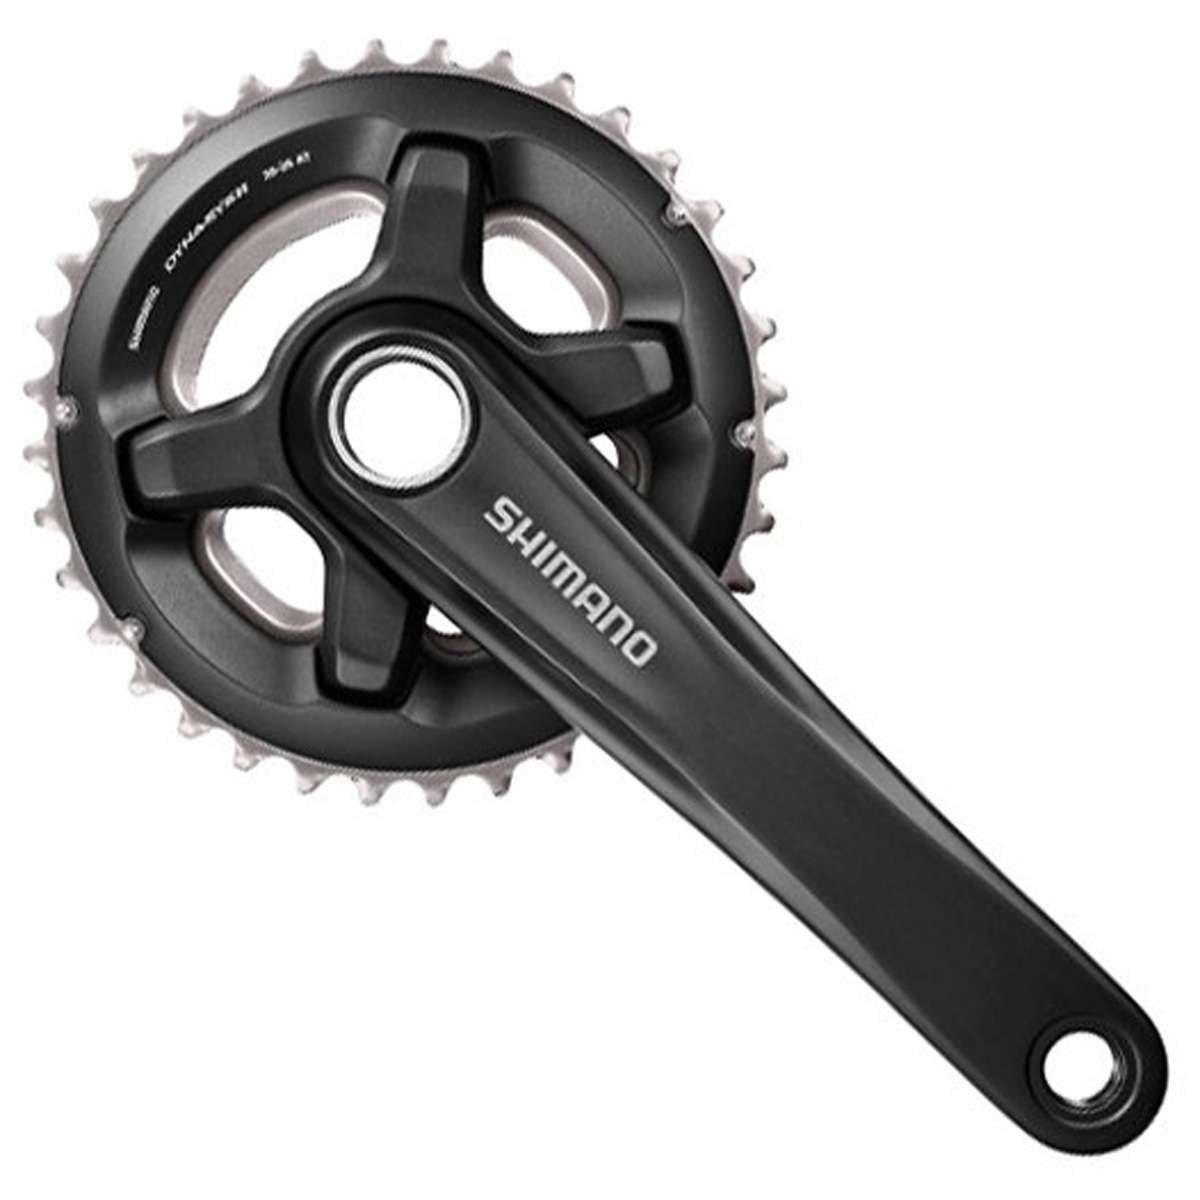 Shimano fc-mt700-b2 11-speedマウンテン自転車クランクセット B06Y145Y4M 170MM, 36X26T